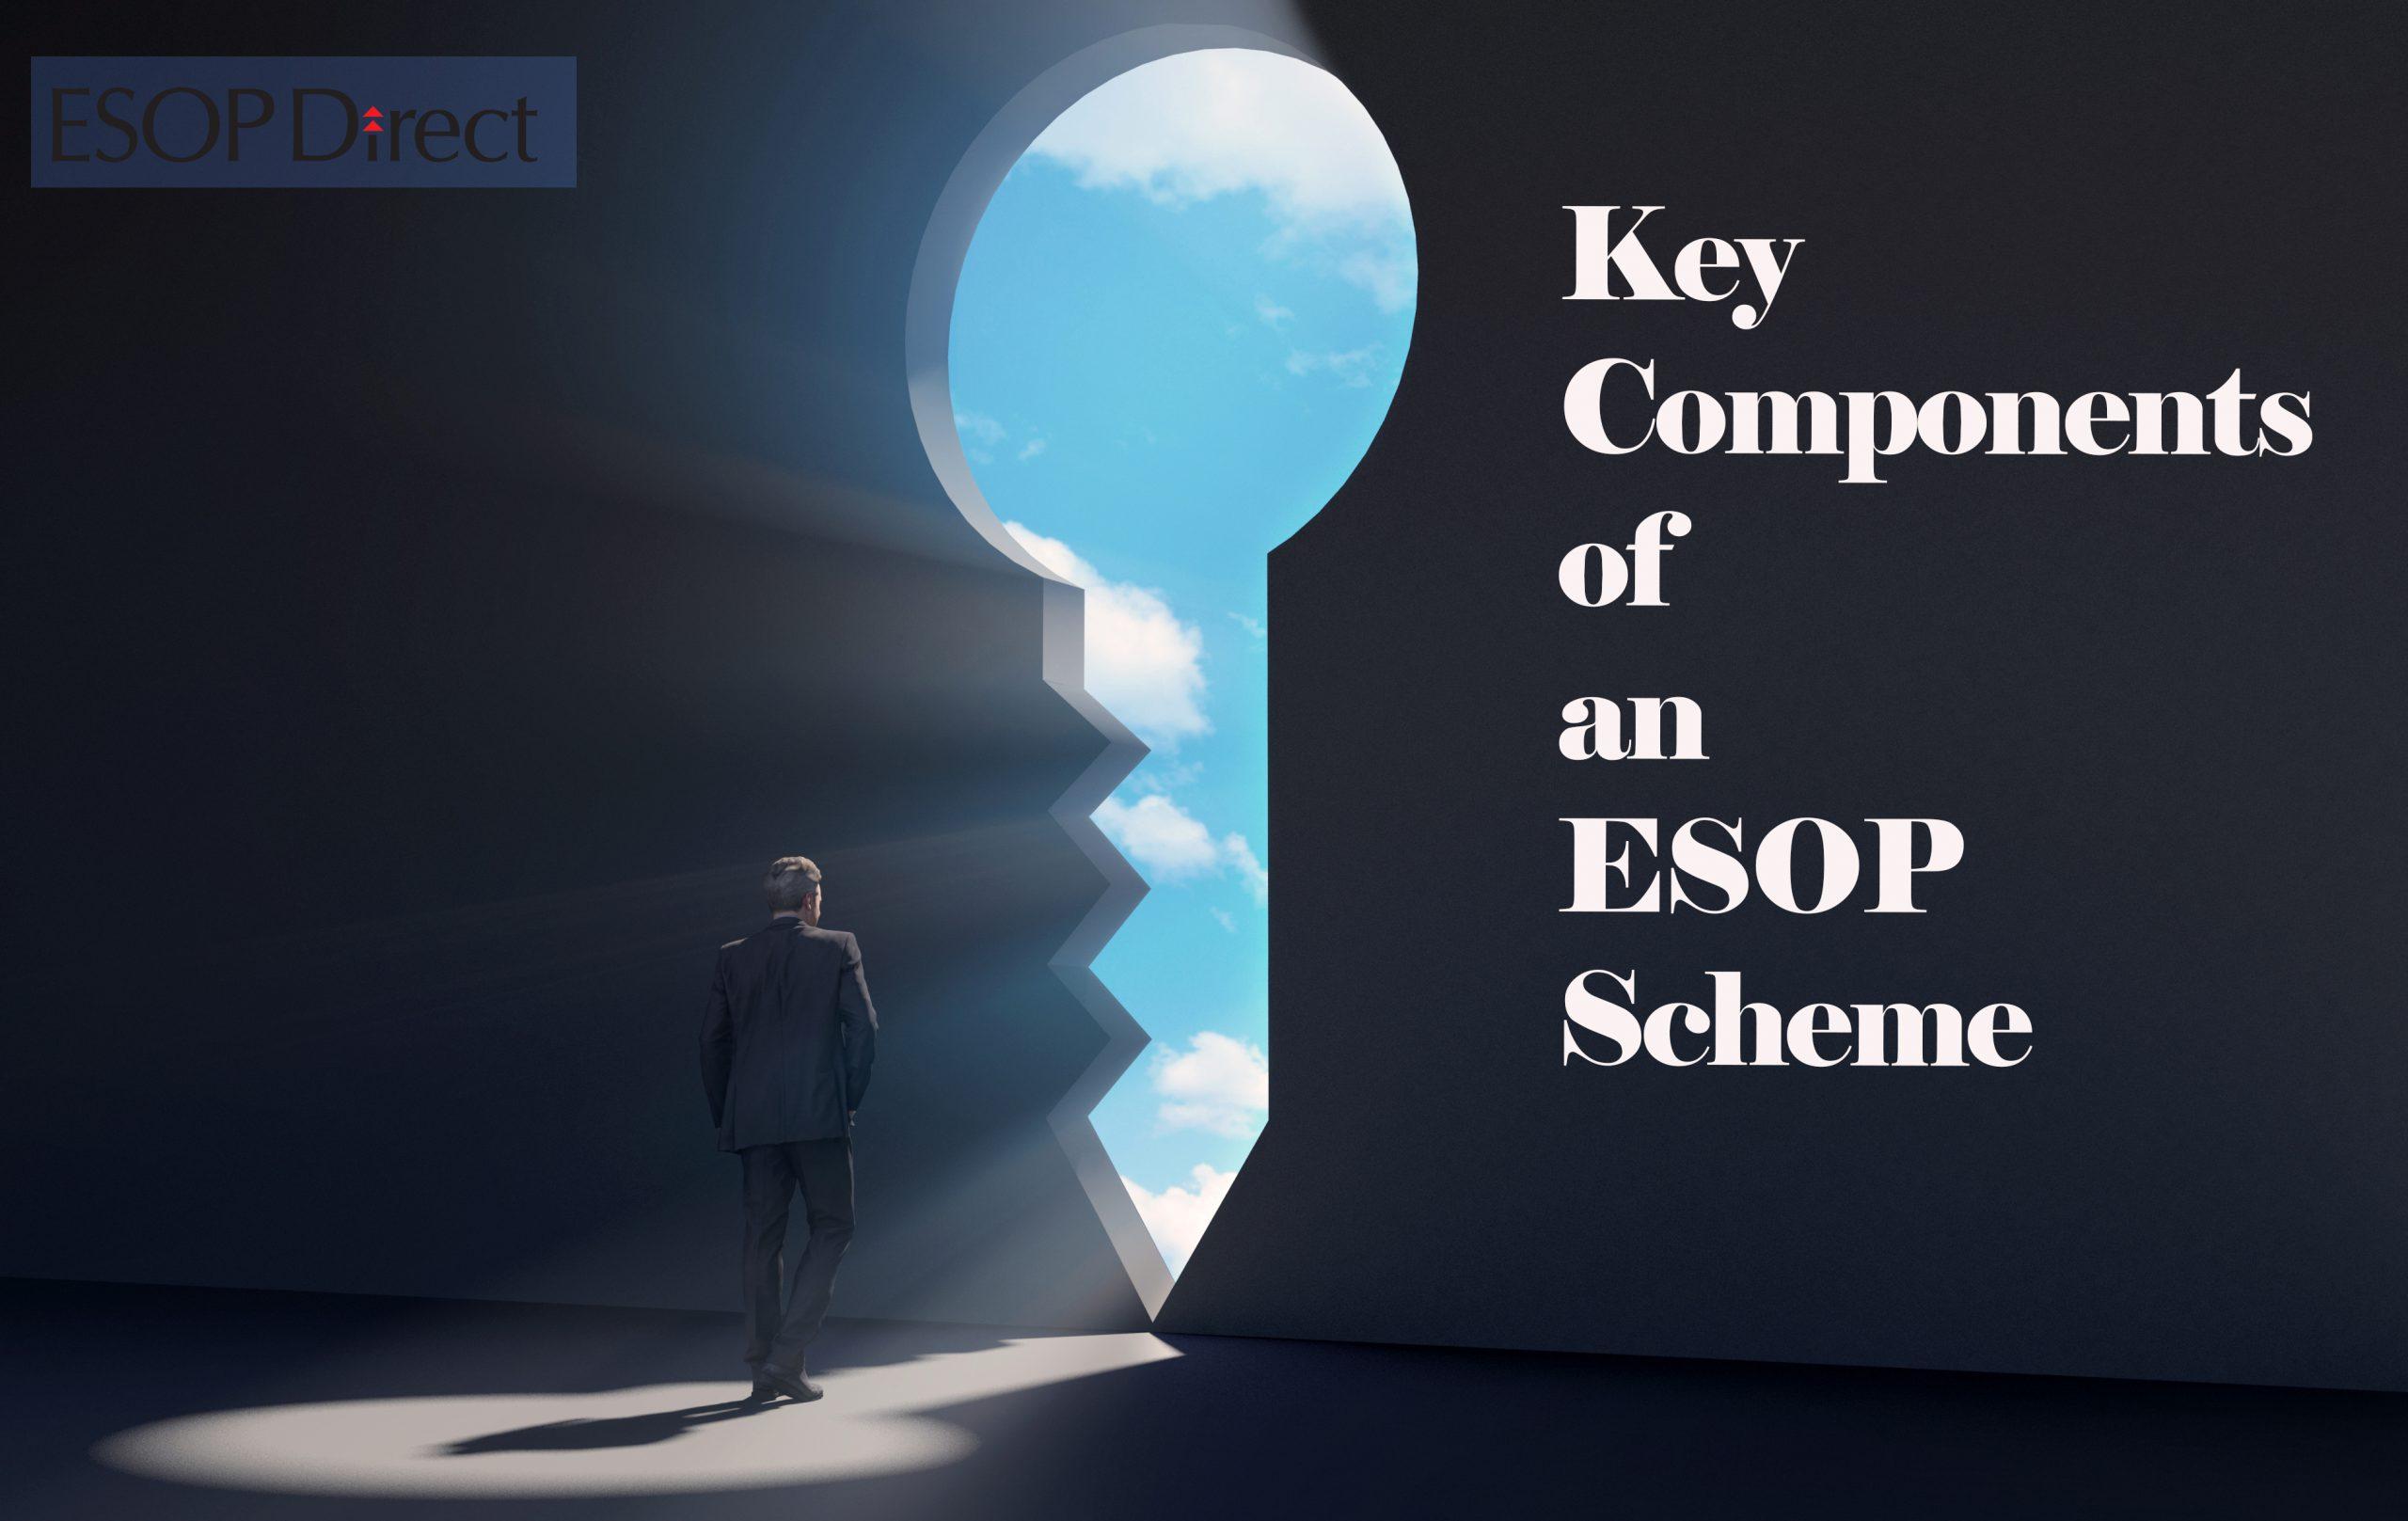 Key Components of ESOP